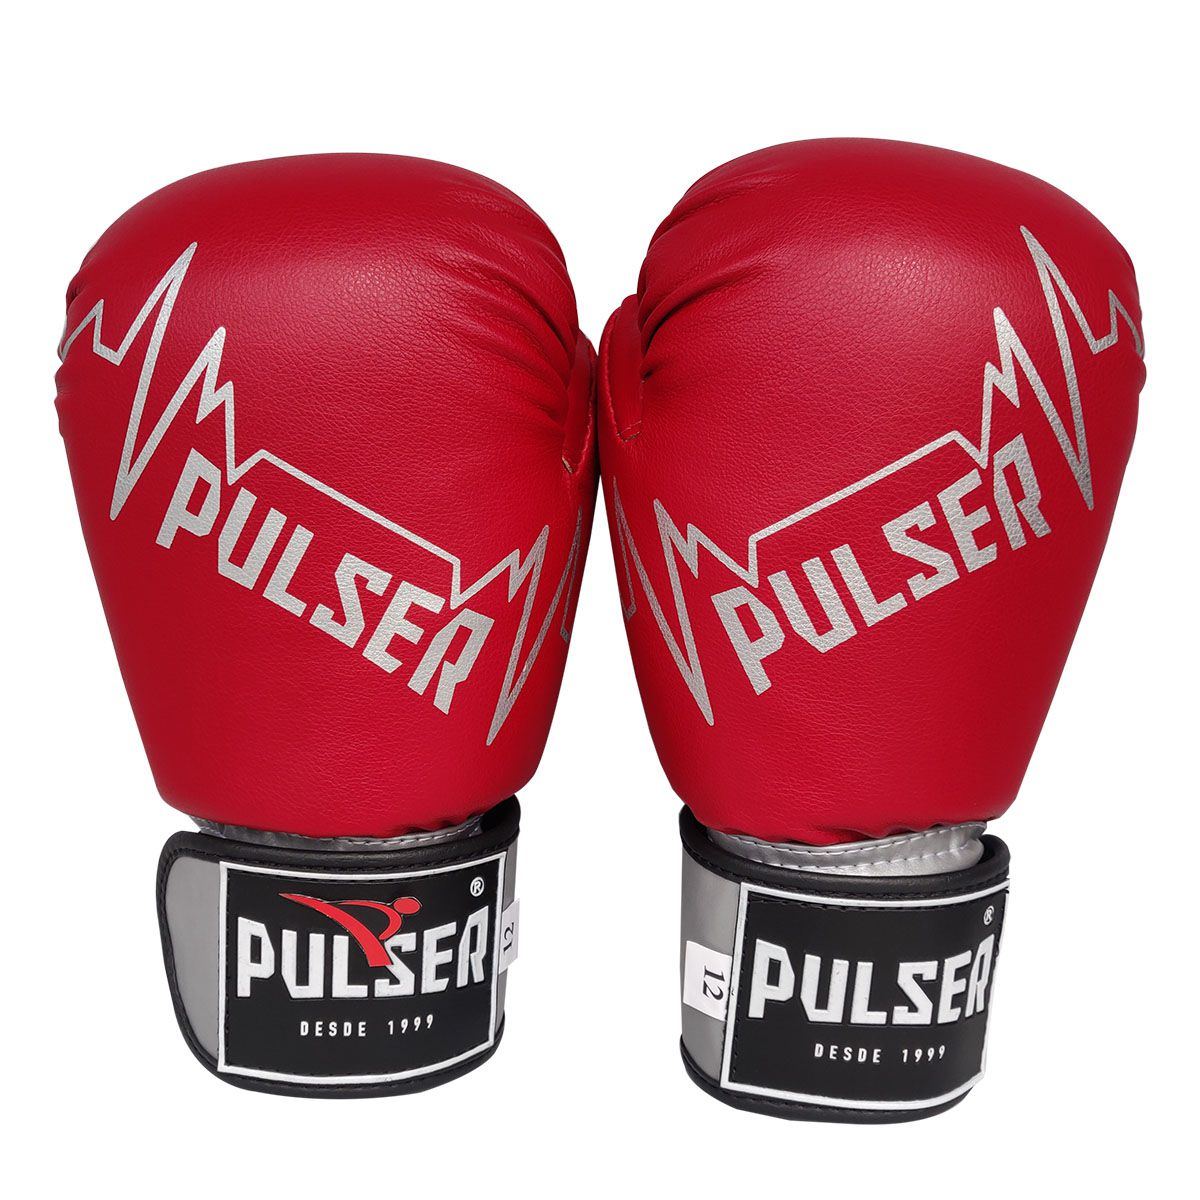 Kit de Boxe / Muay Thai 14oz - Vermelho Pulser Logo - Pulser  - PRALUTA SHOP